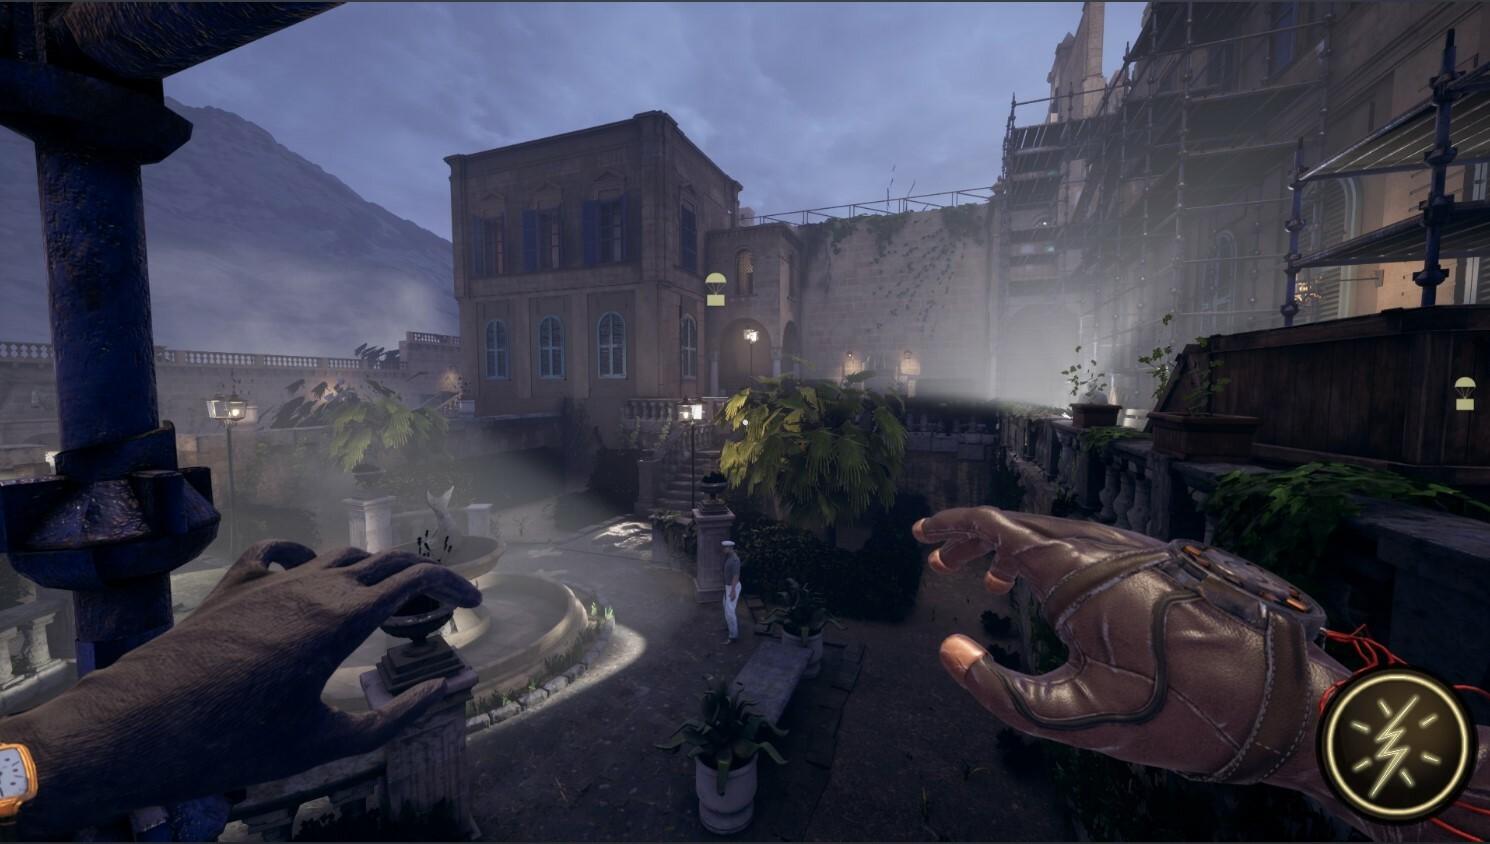 In-game screenshot.